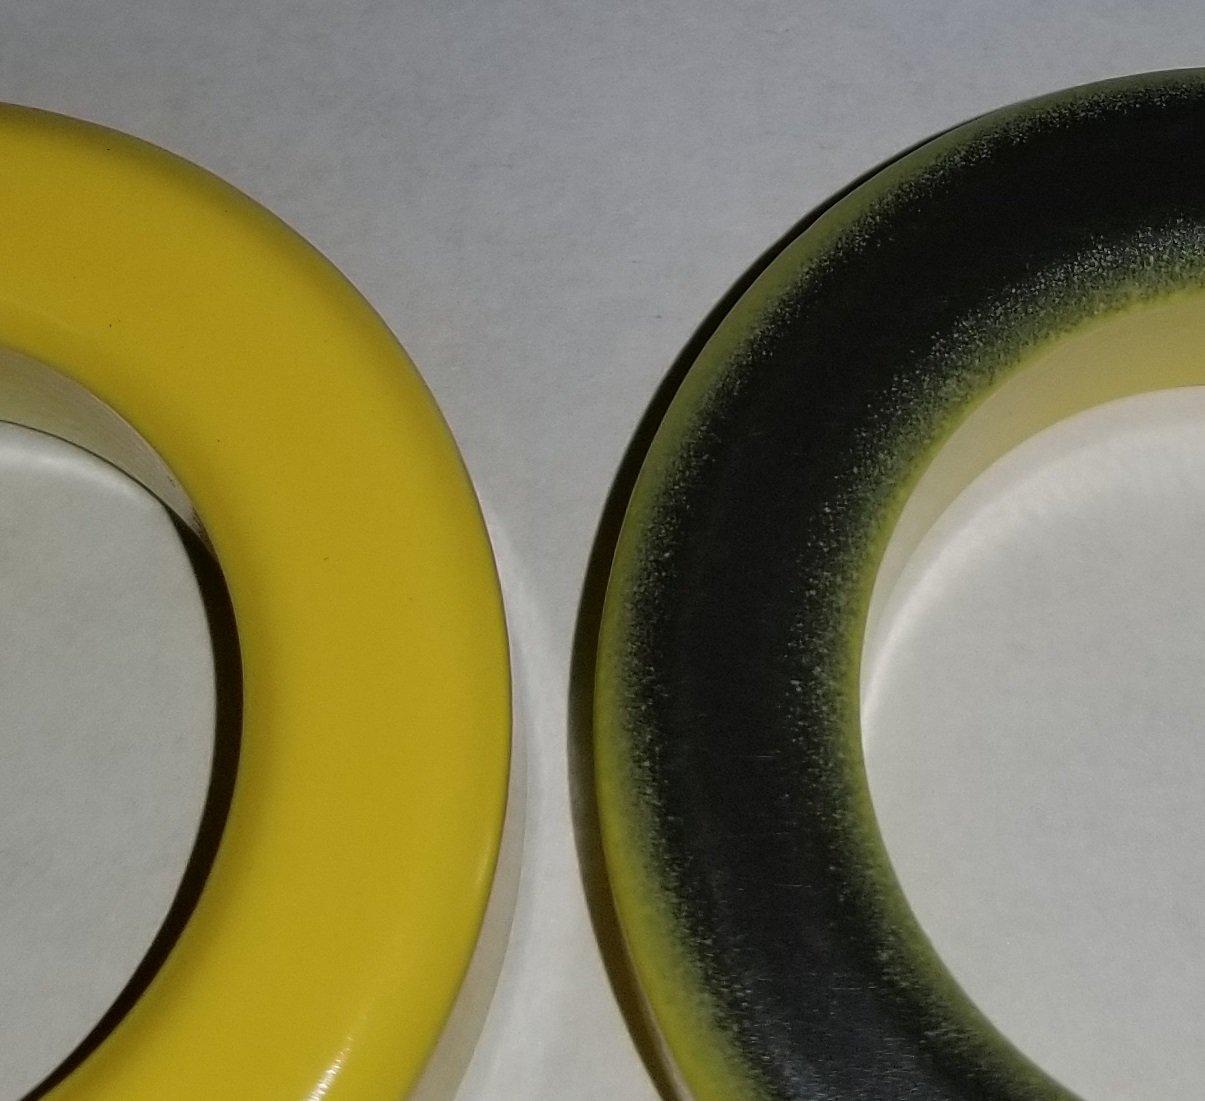 4 Toroid T130-6 Core Micrometals